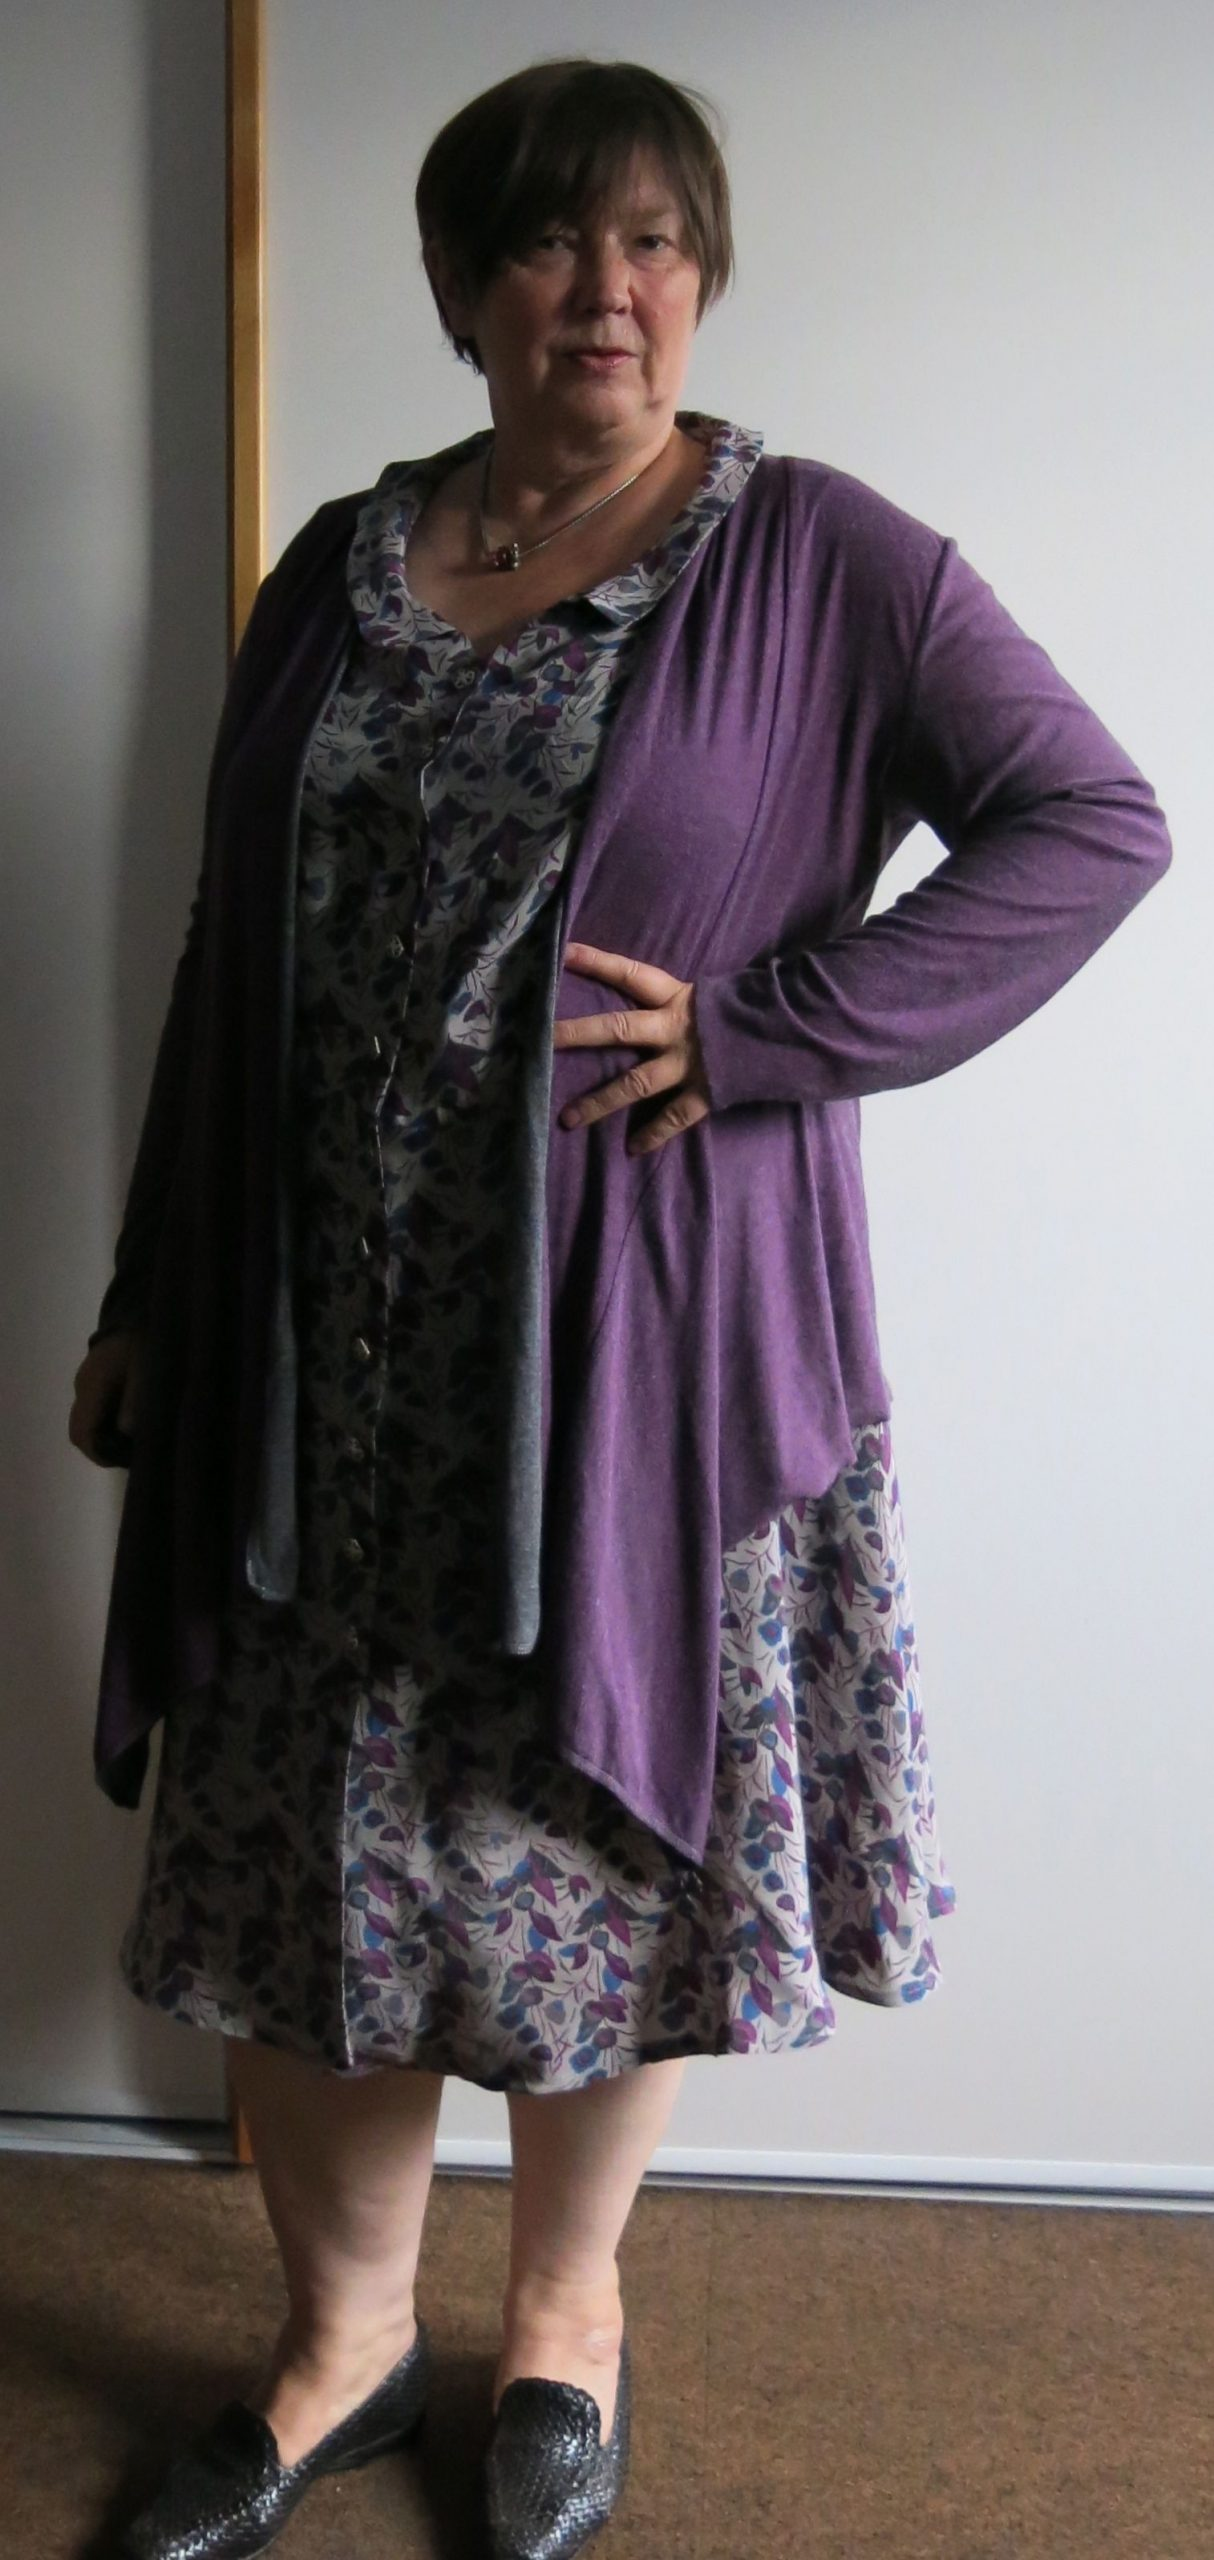 15 Genial Ältere Damen Kleider ÄrmelFormal Fantastisch Ältere Damen Kleider Bester Preis